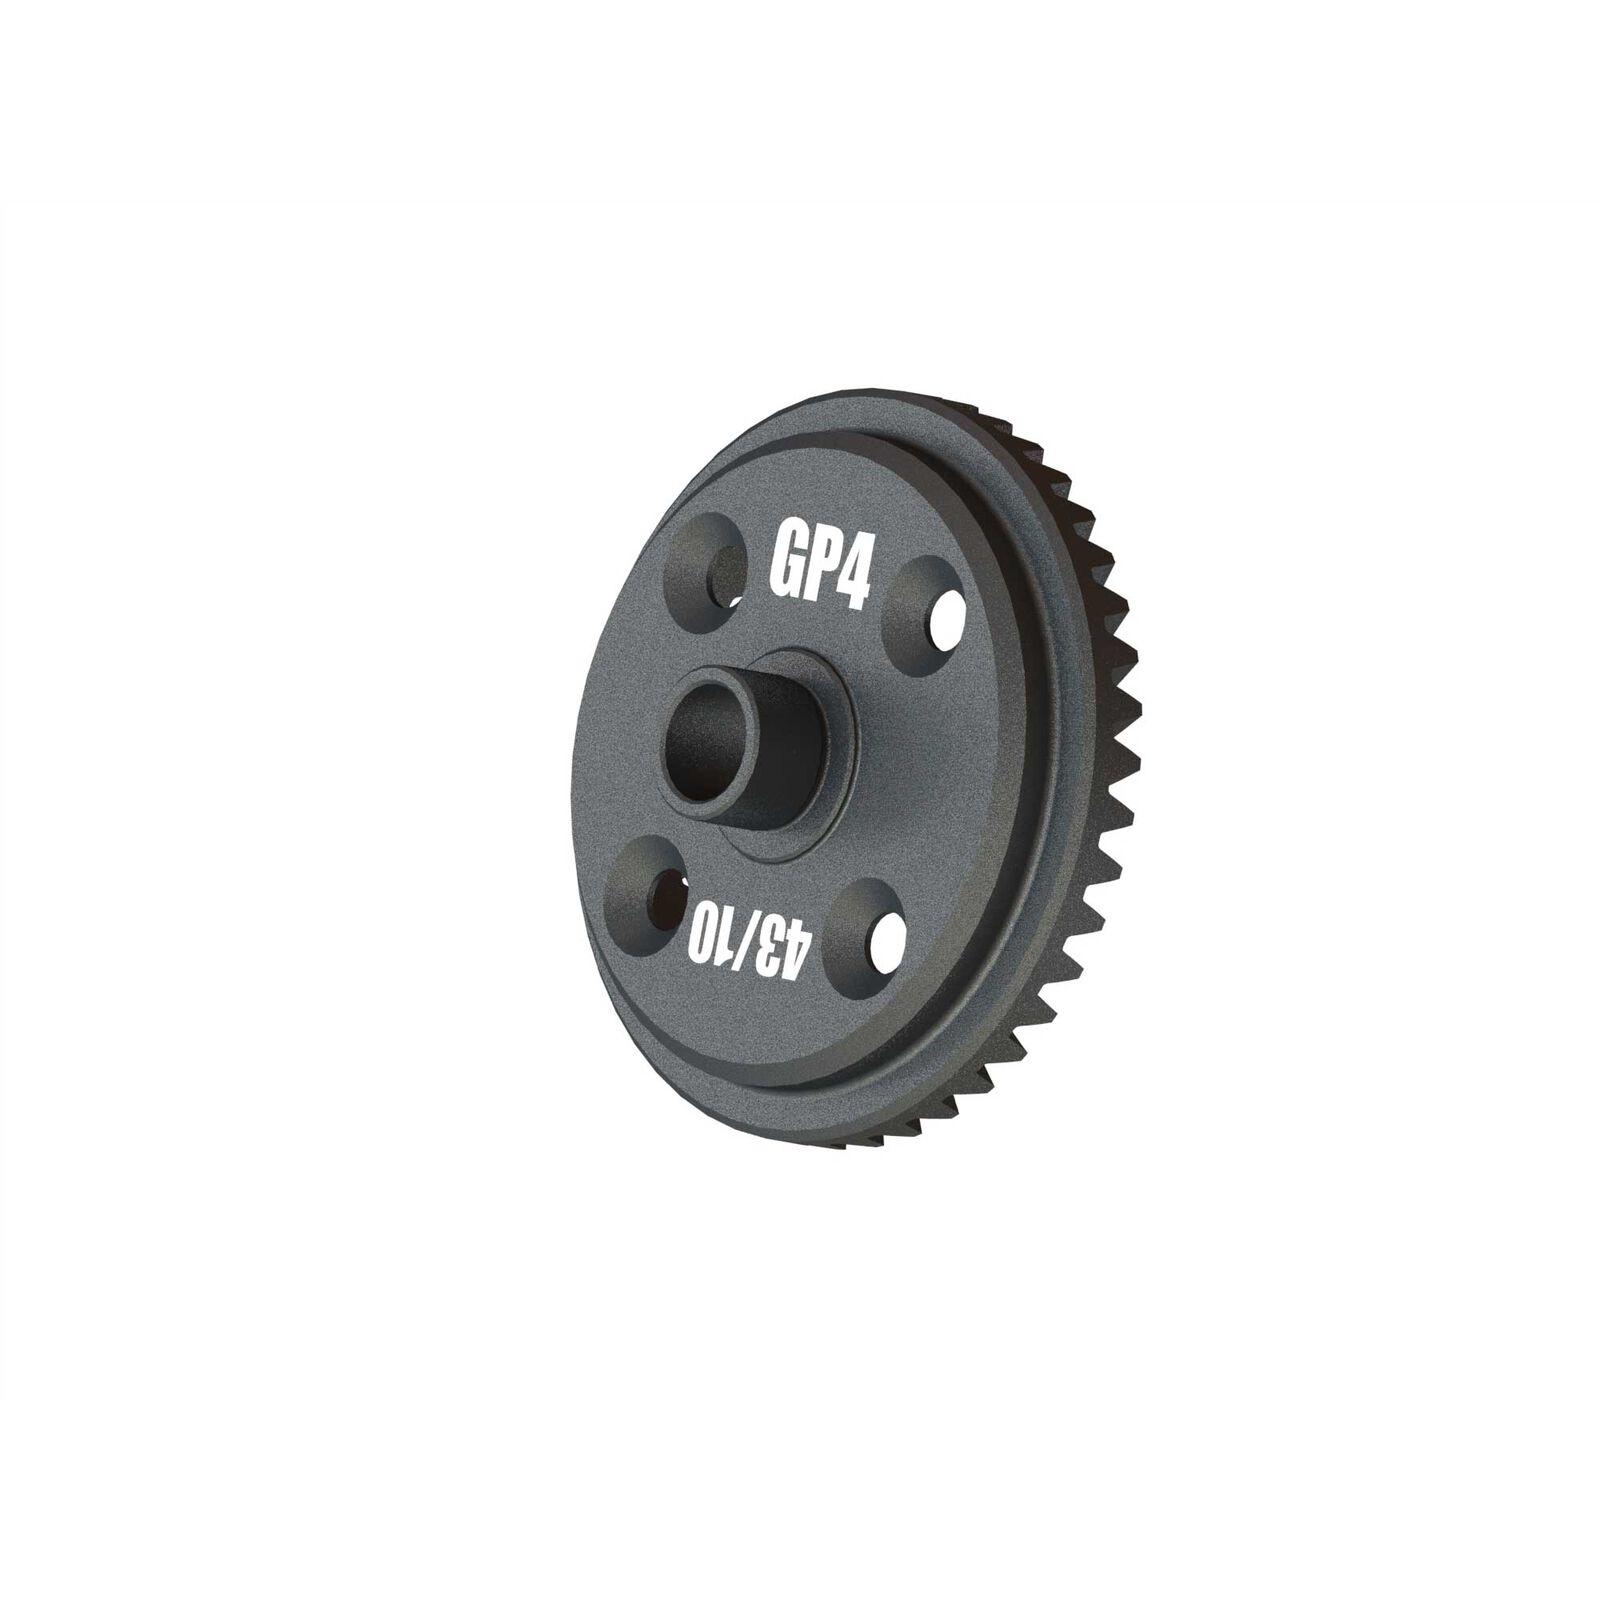 Main Diff Gear, 43T Spiral GP4 5mm: EXB